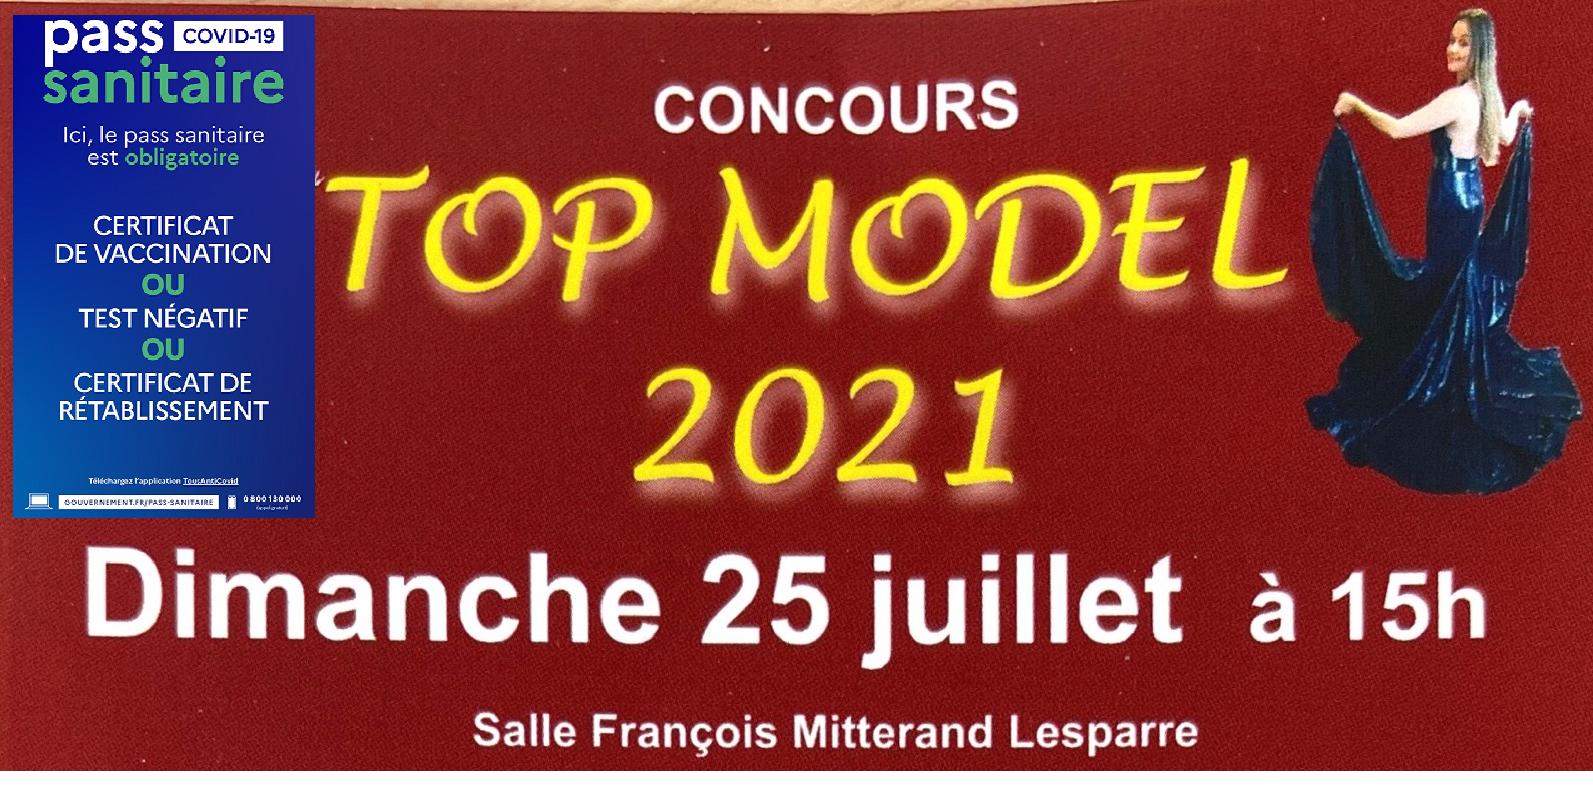 Top model 2021_affiche pass sanitaire